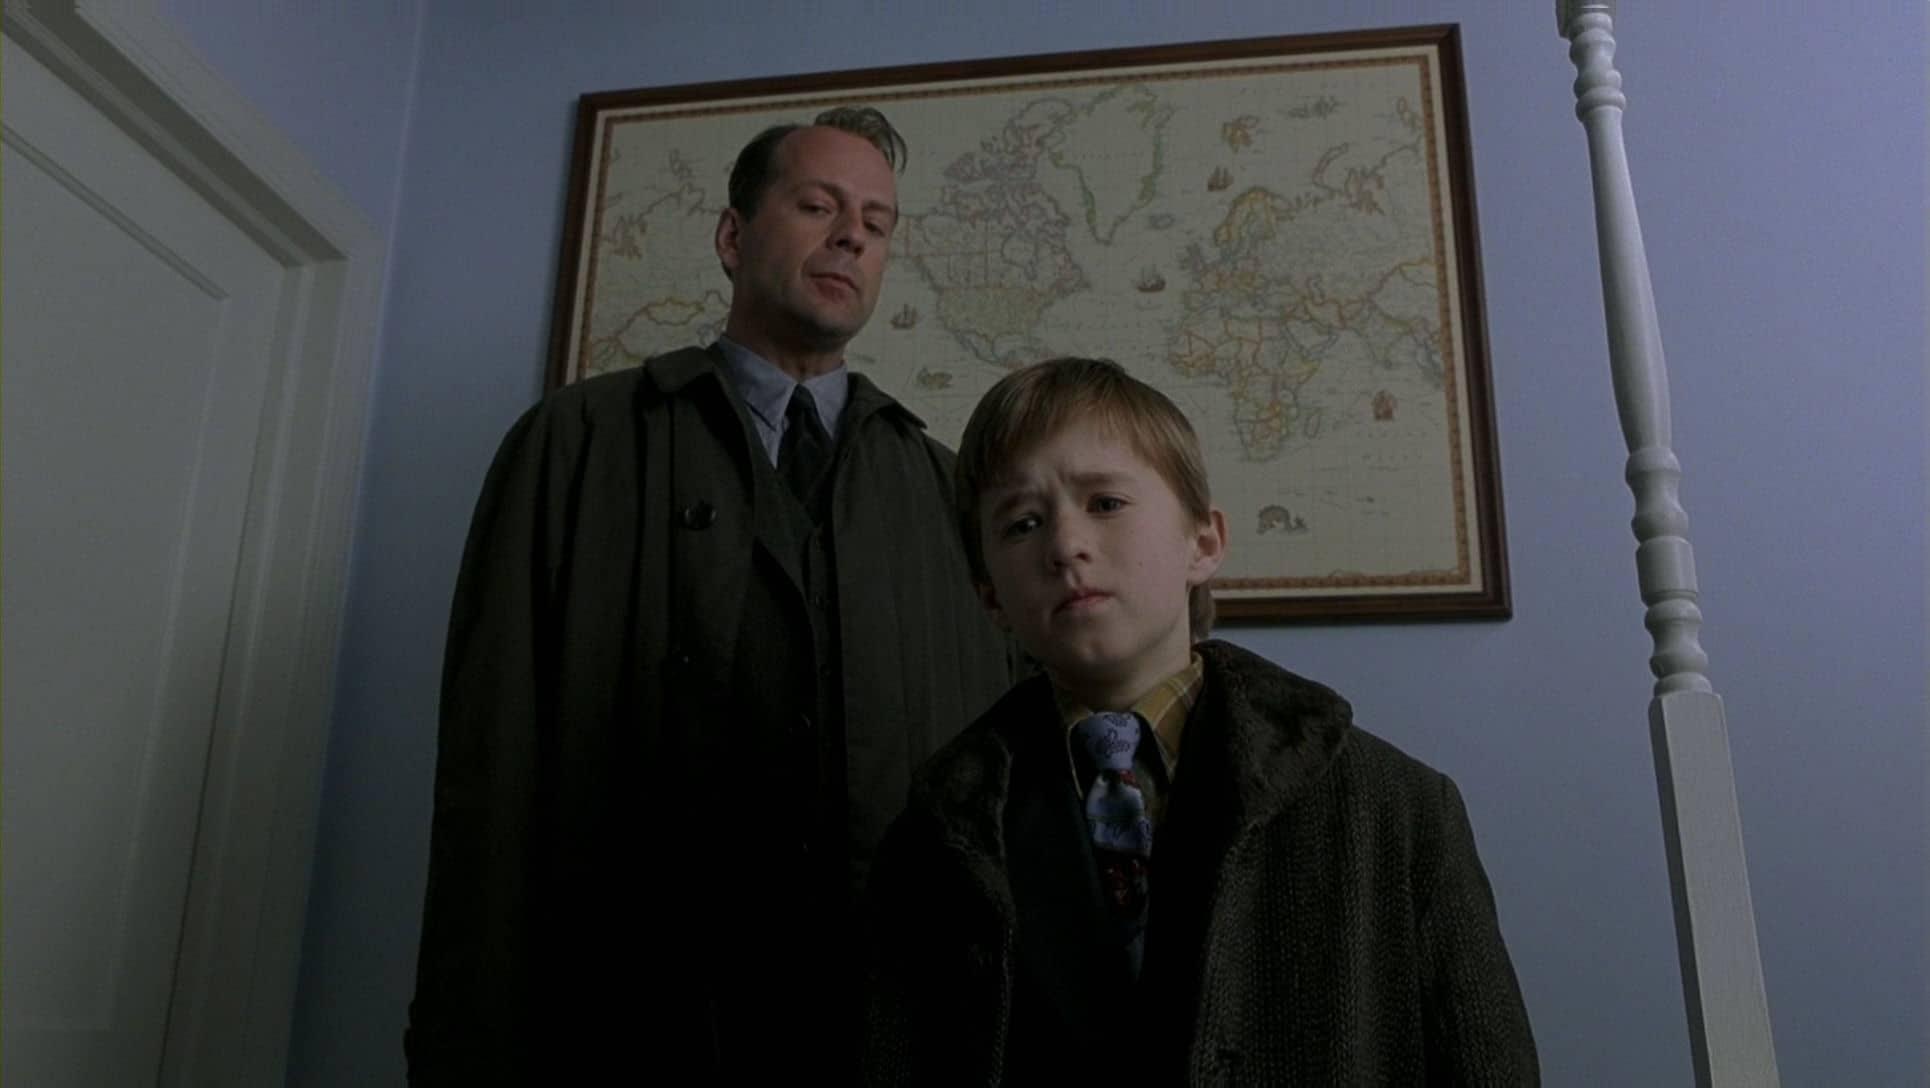 The Sixth Sense – thriller movie